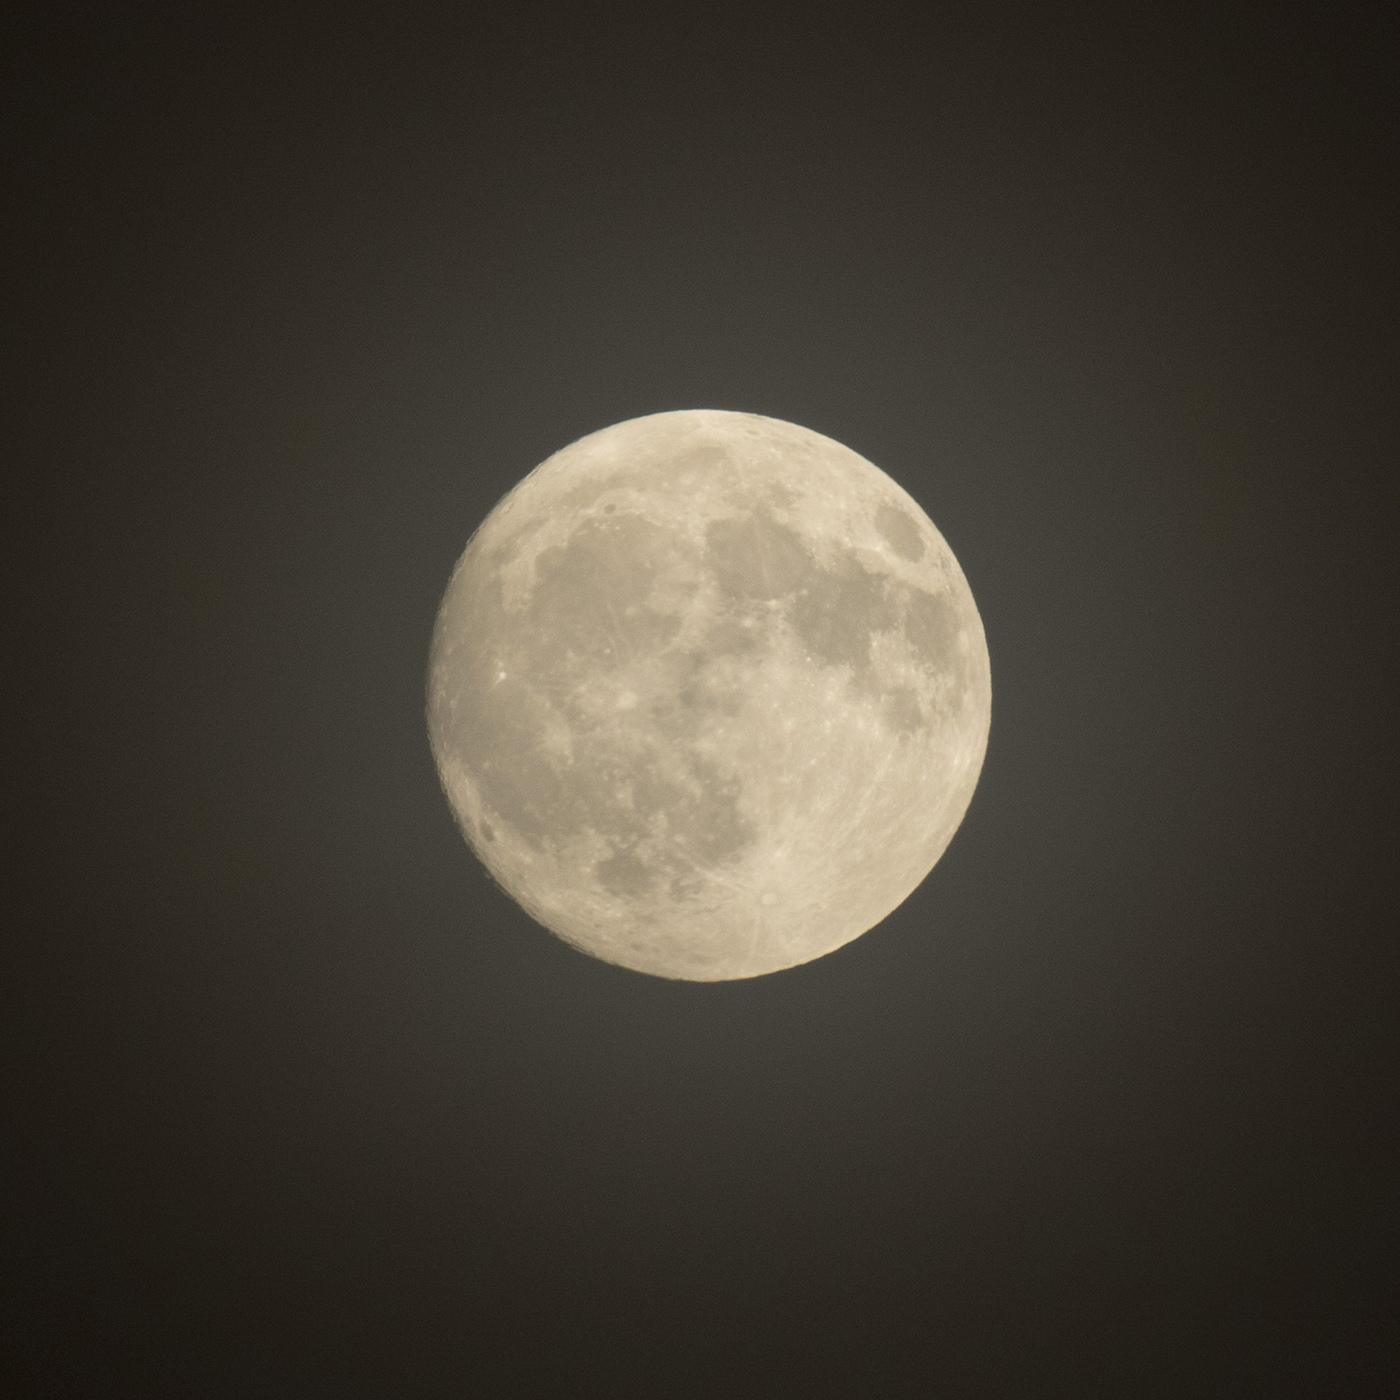 la lune, au soir du 04/10/2017  (31494  rawjpegas.jpg)